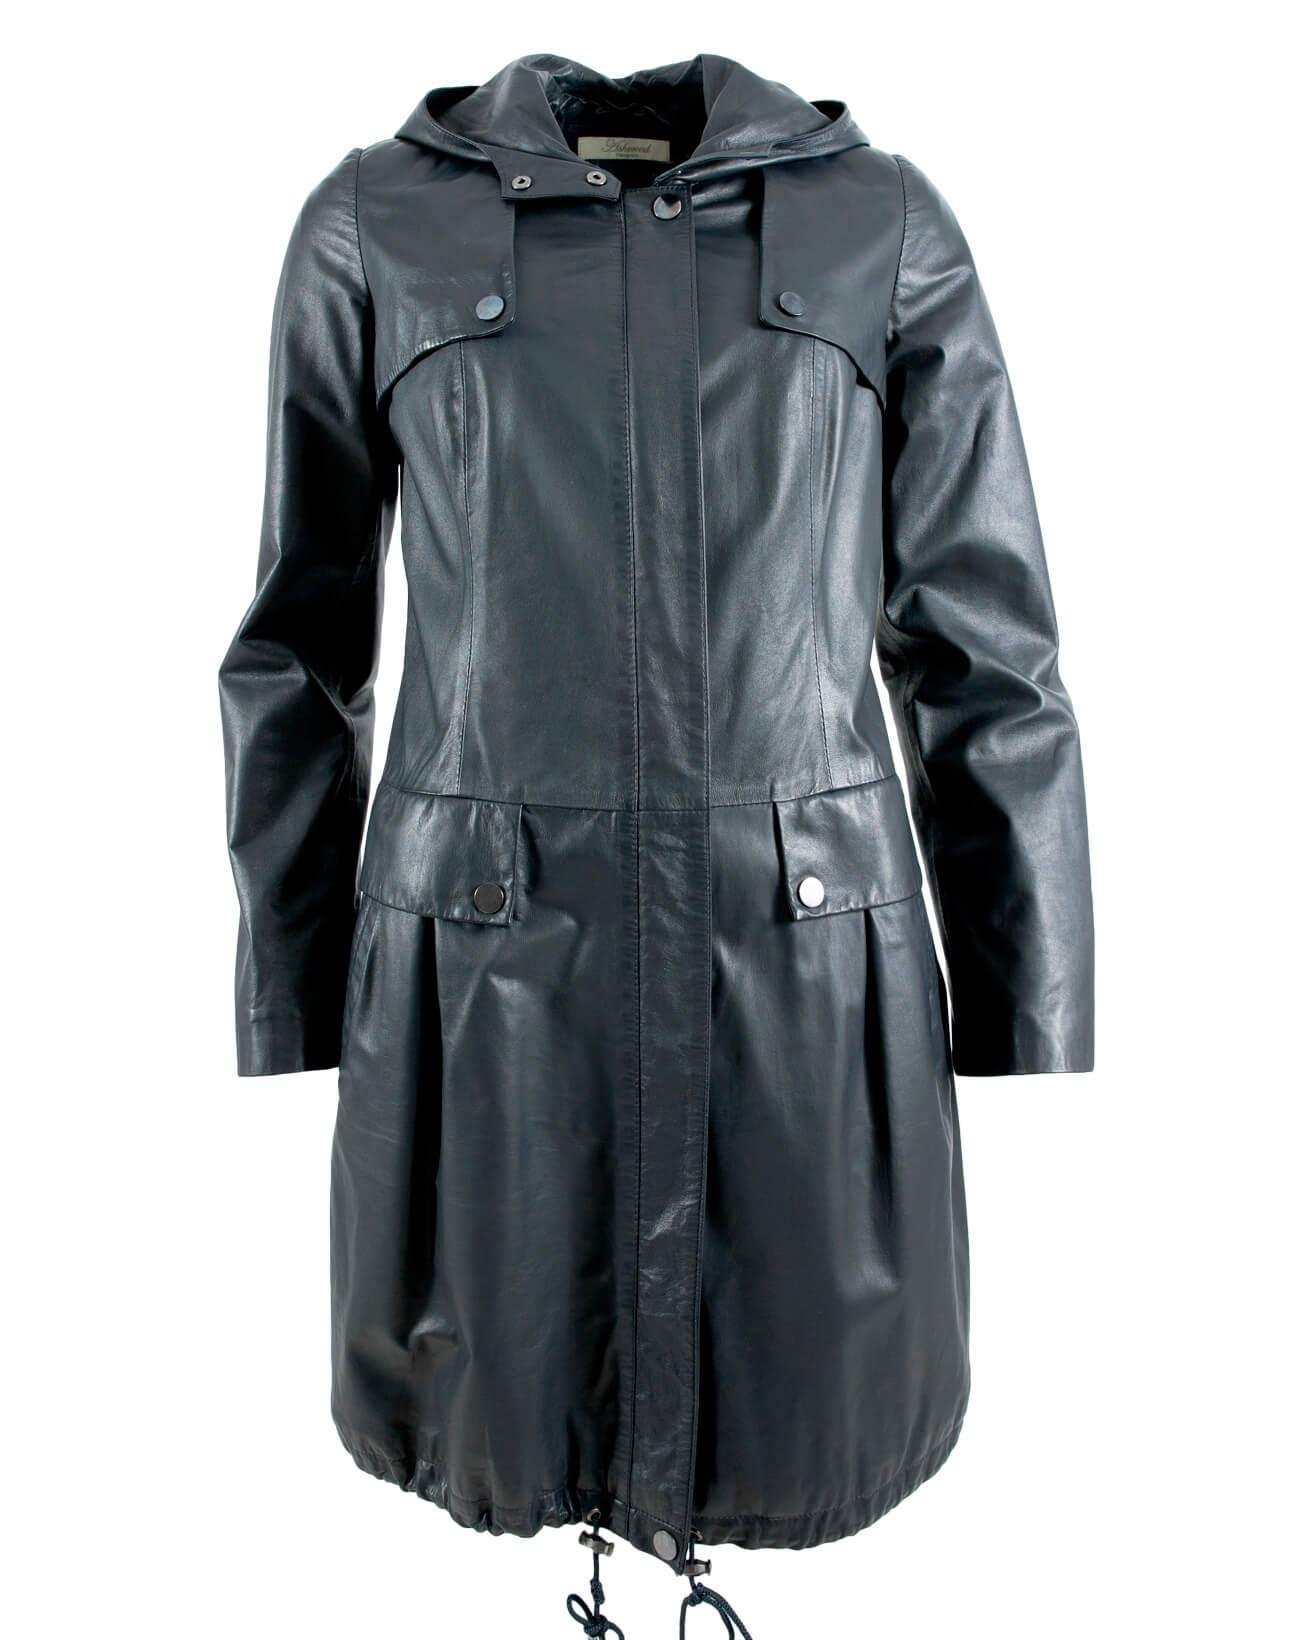 7570_leather-parka_navy_front_comp.jpg